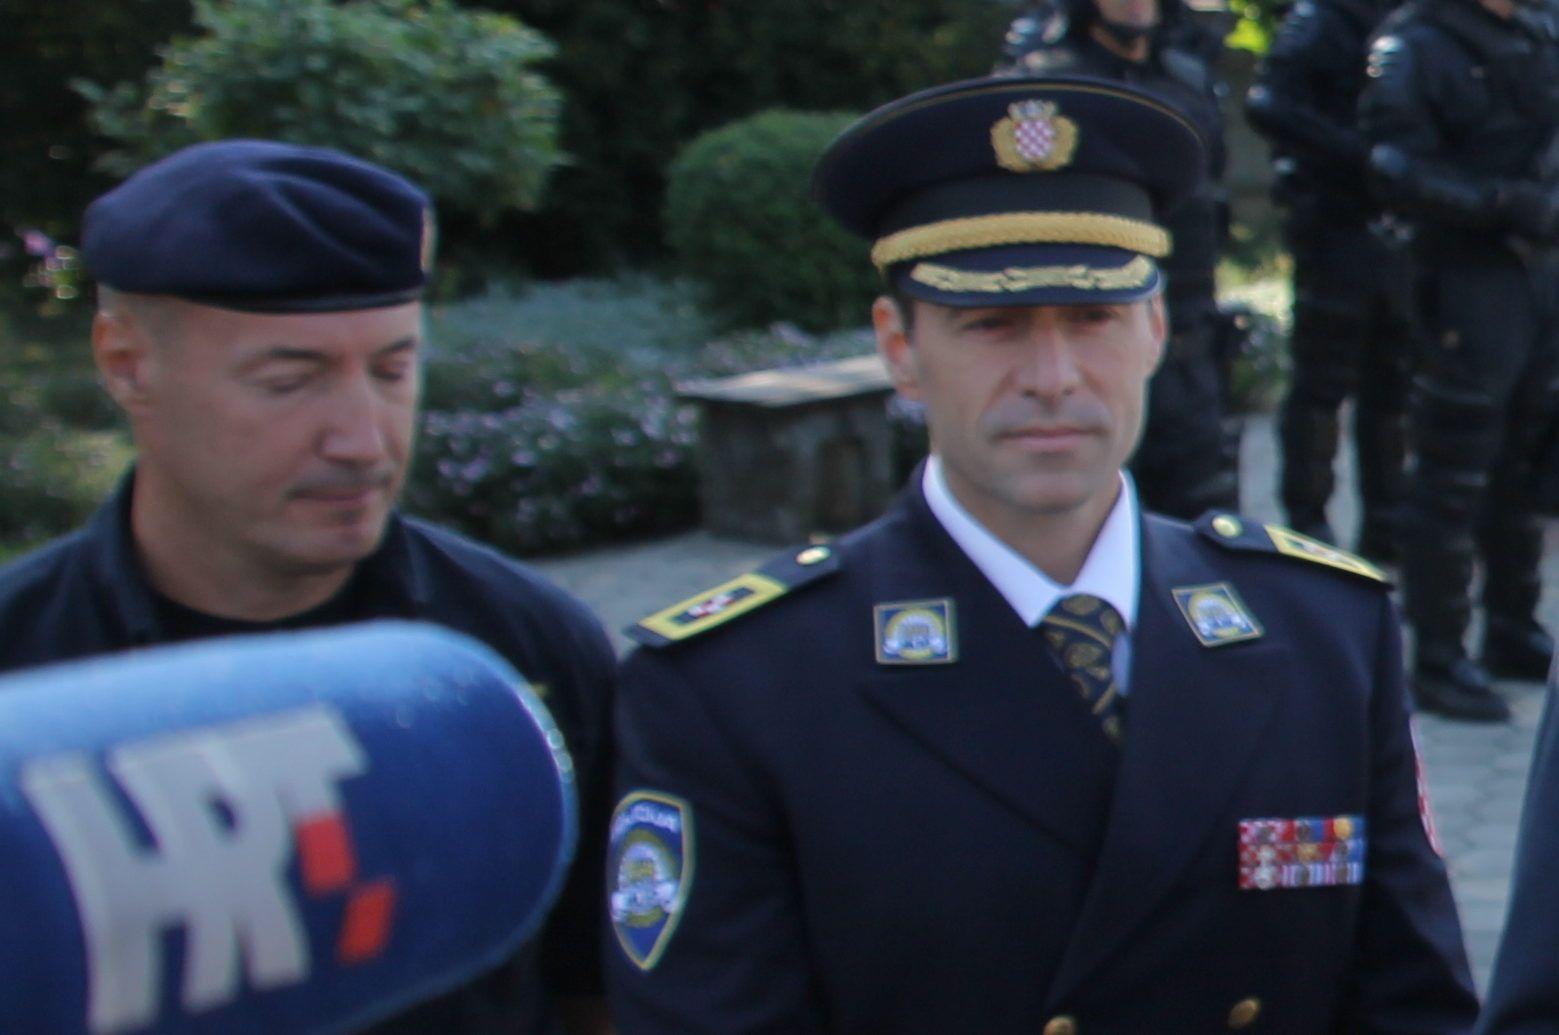 Zbog prebrze vožnje uz zamjenika ravnatelja policije Ćelića smijenjen i šef zadarske prometne te načelnik krapinsko-zagorske policije